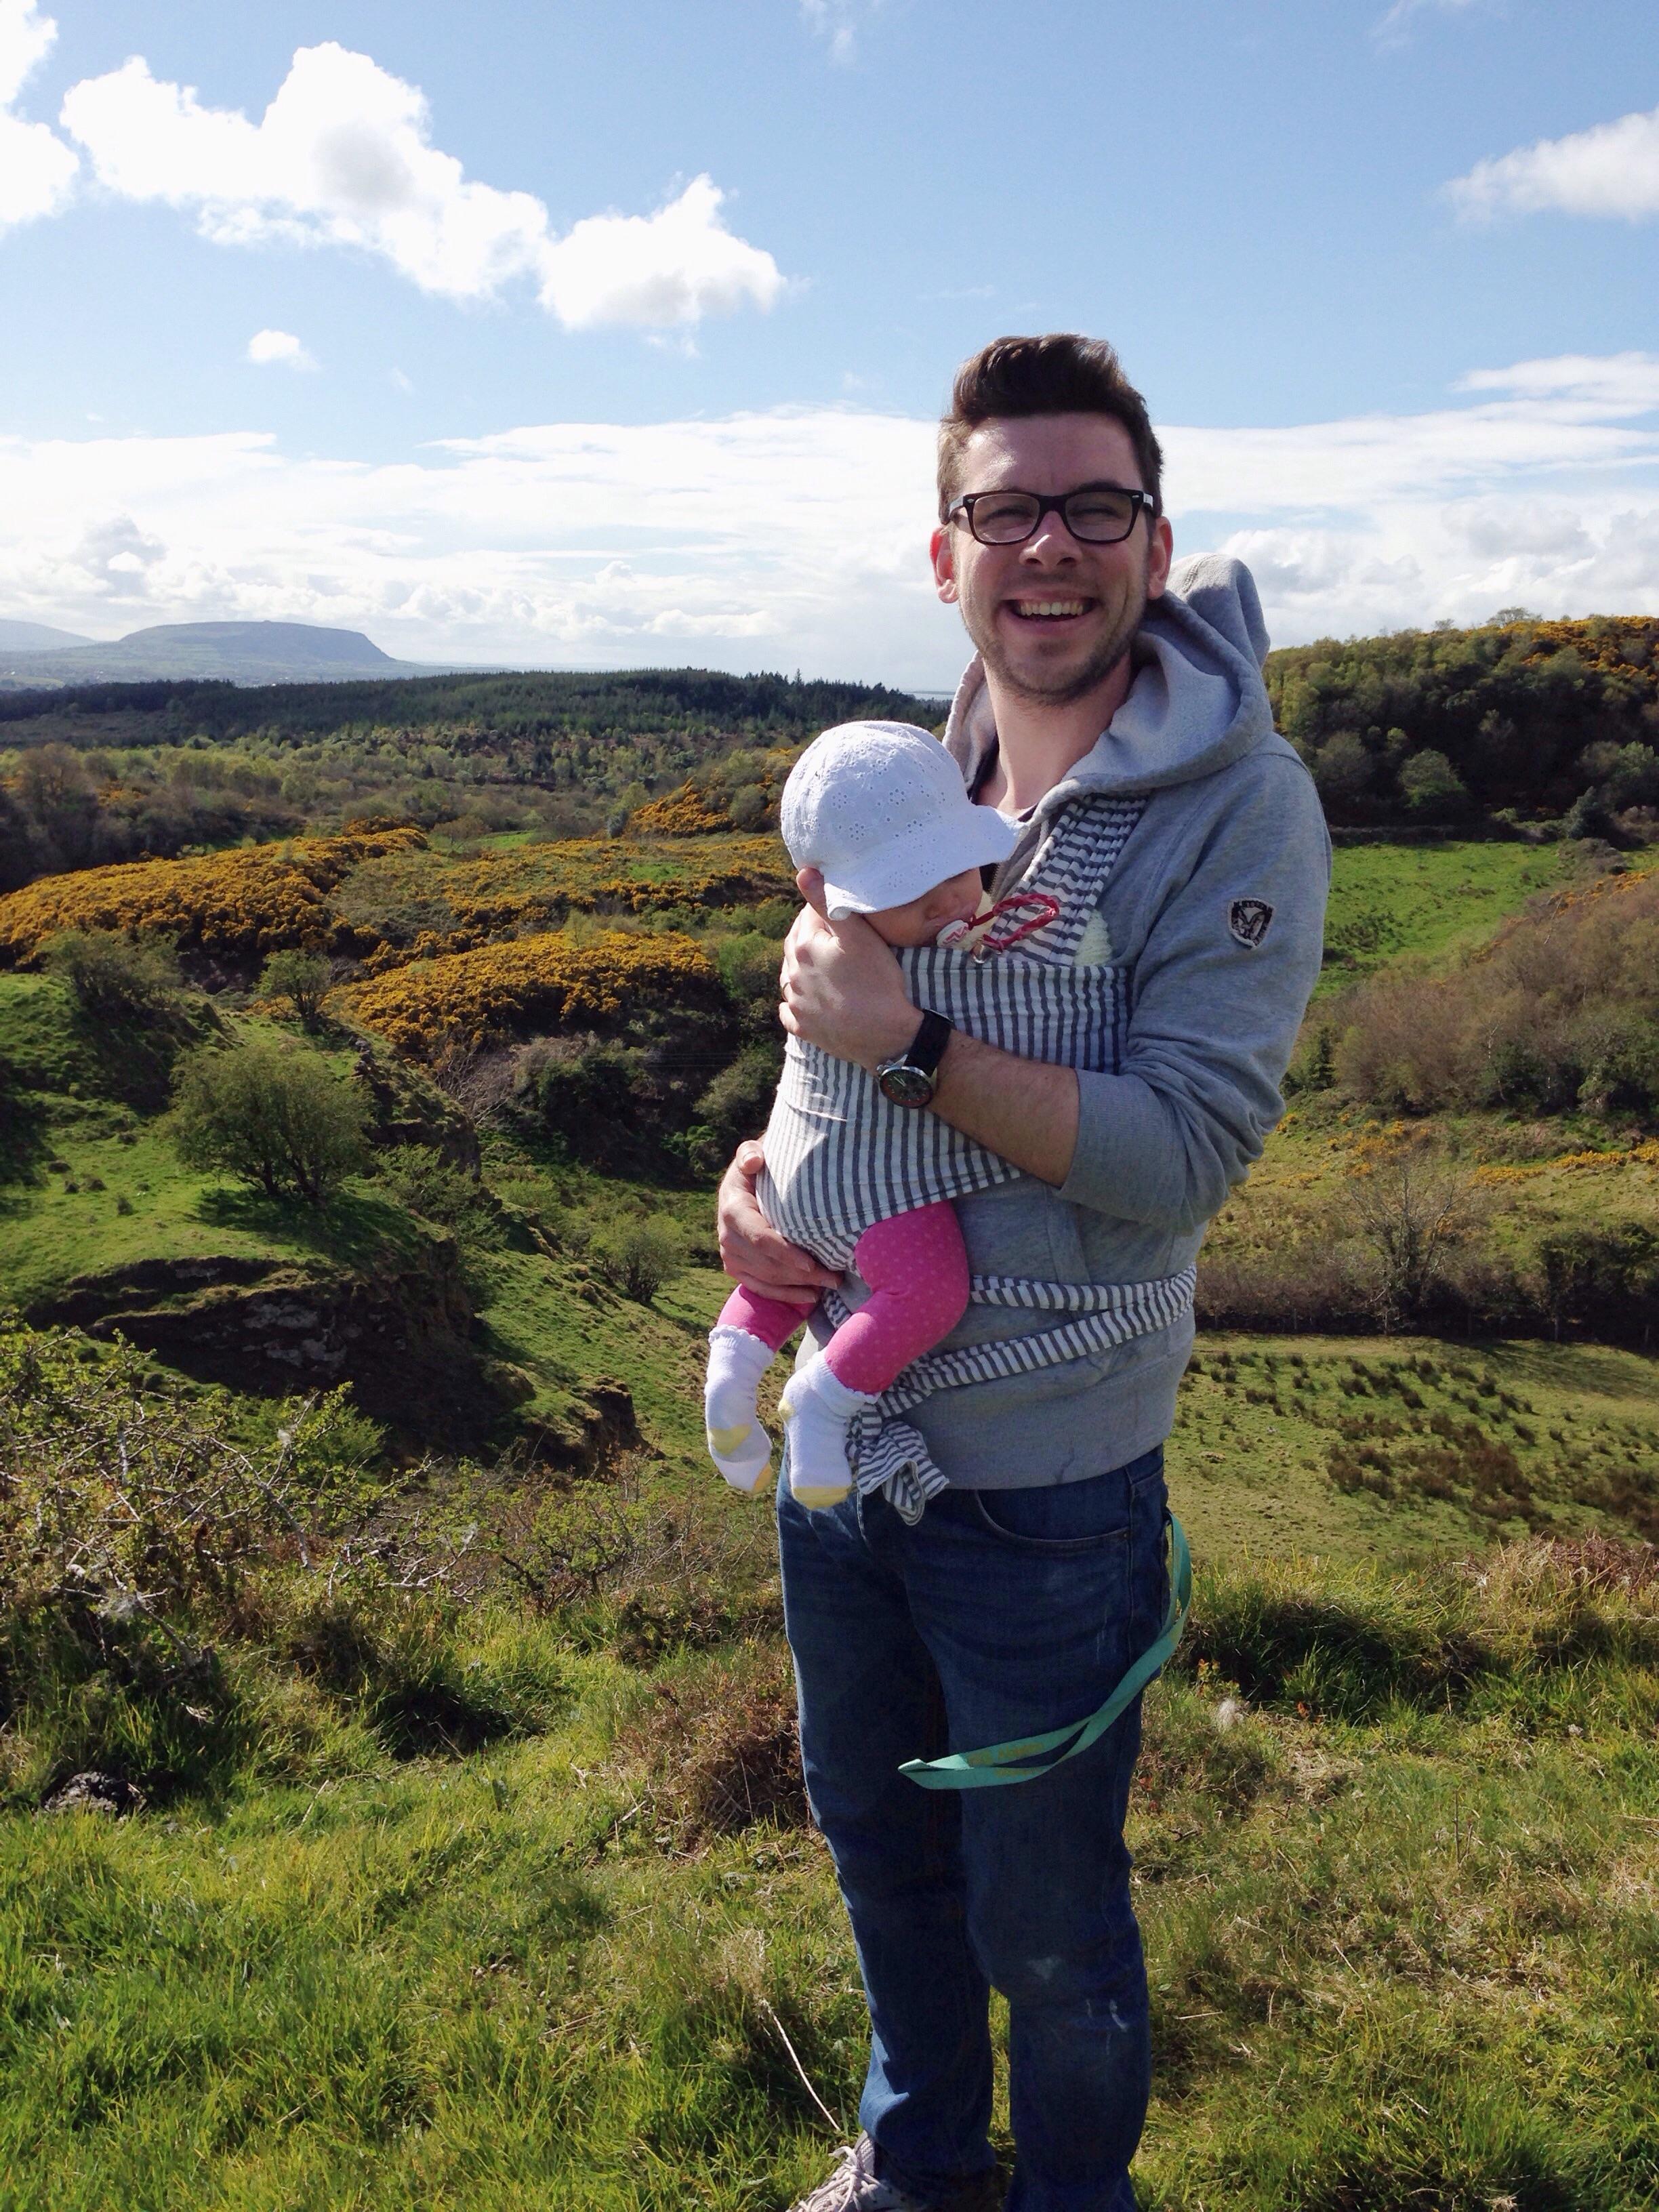 At the summit, Sligo